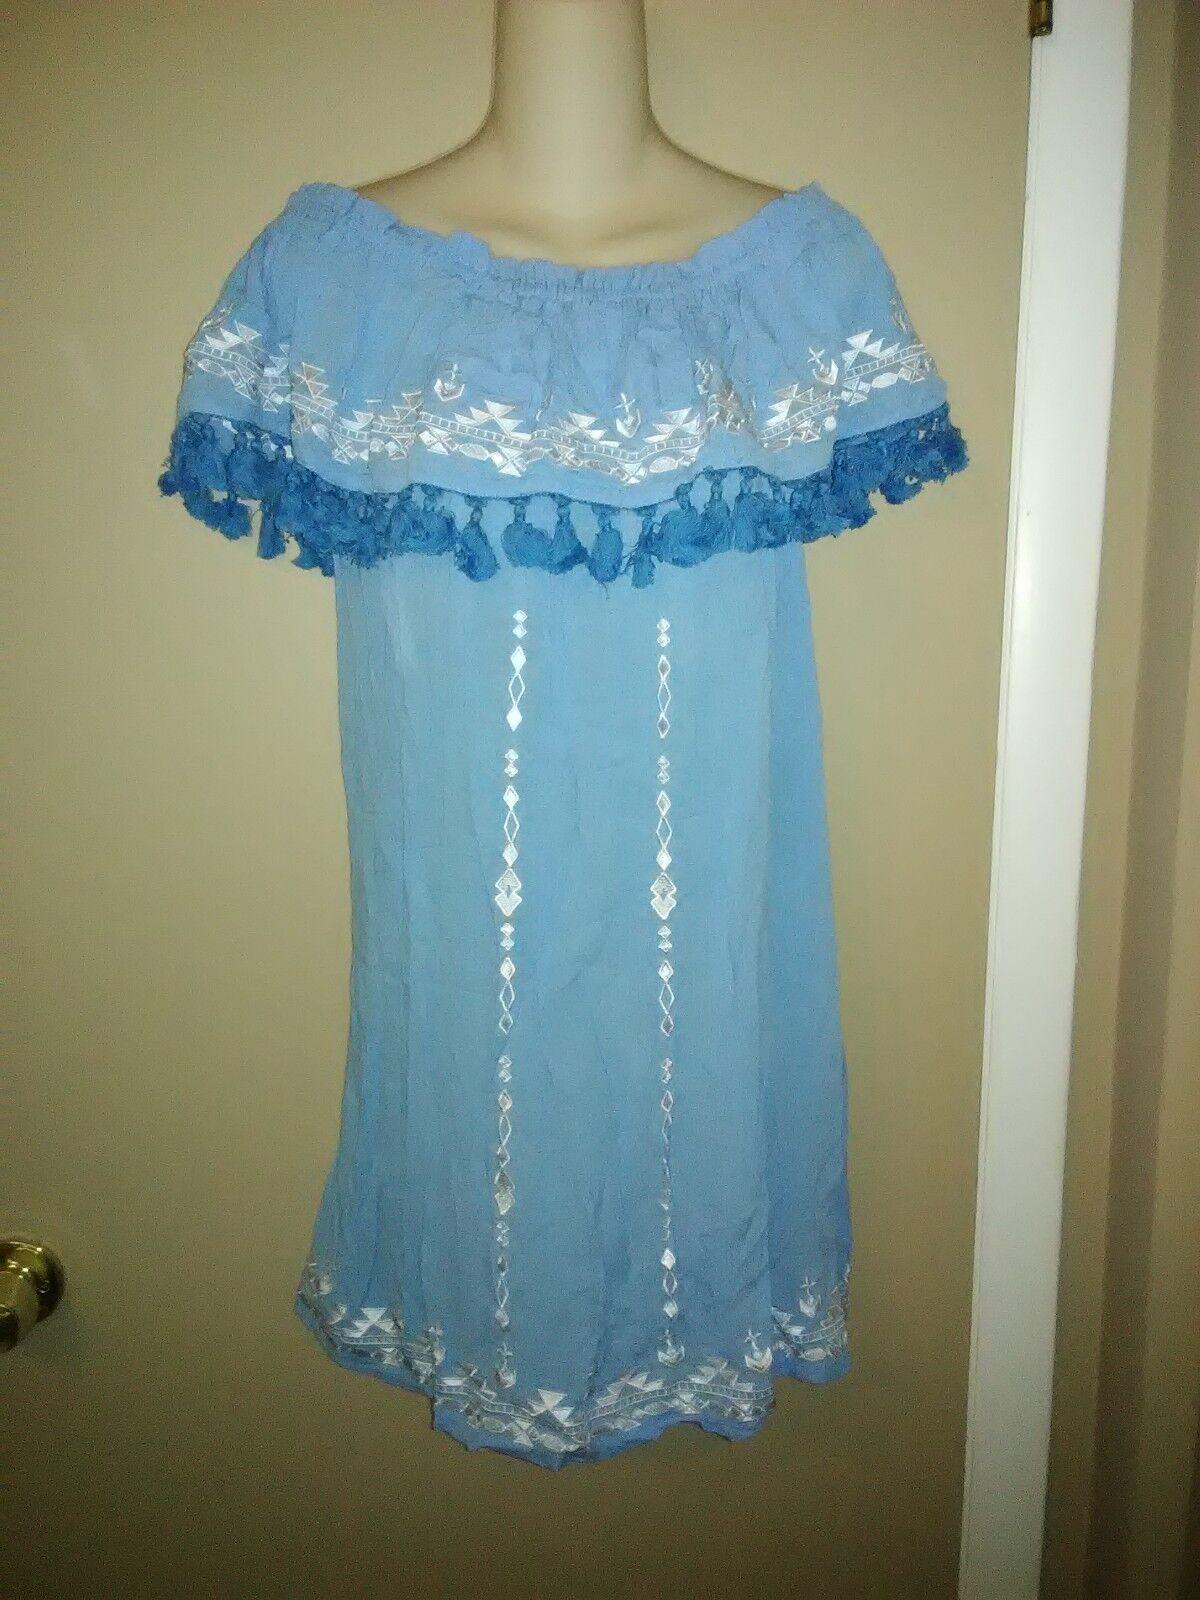 PARKER  Jeanette Jugara del hombro vestido azul onda tasssels-tamaño S (6) – Nuevo sin etiquetas  preferente